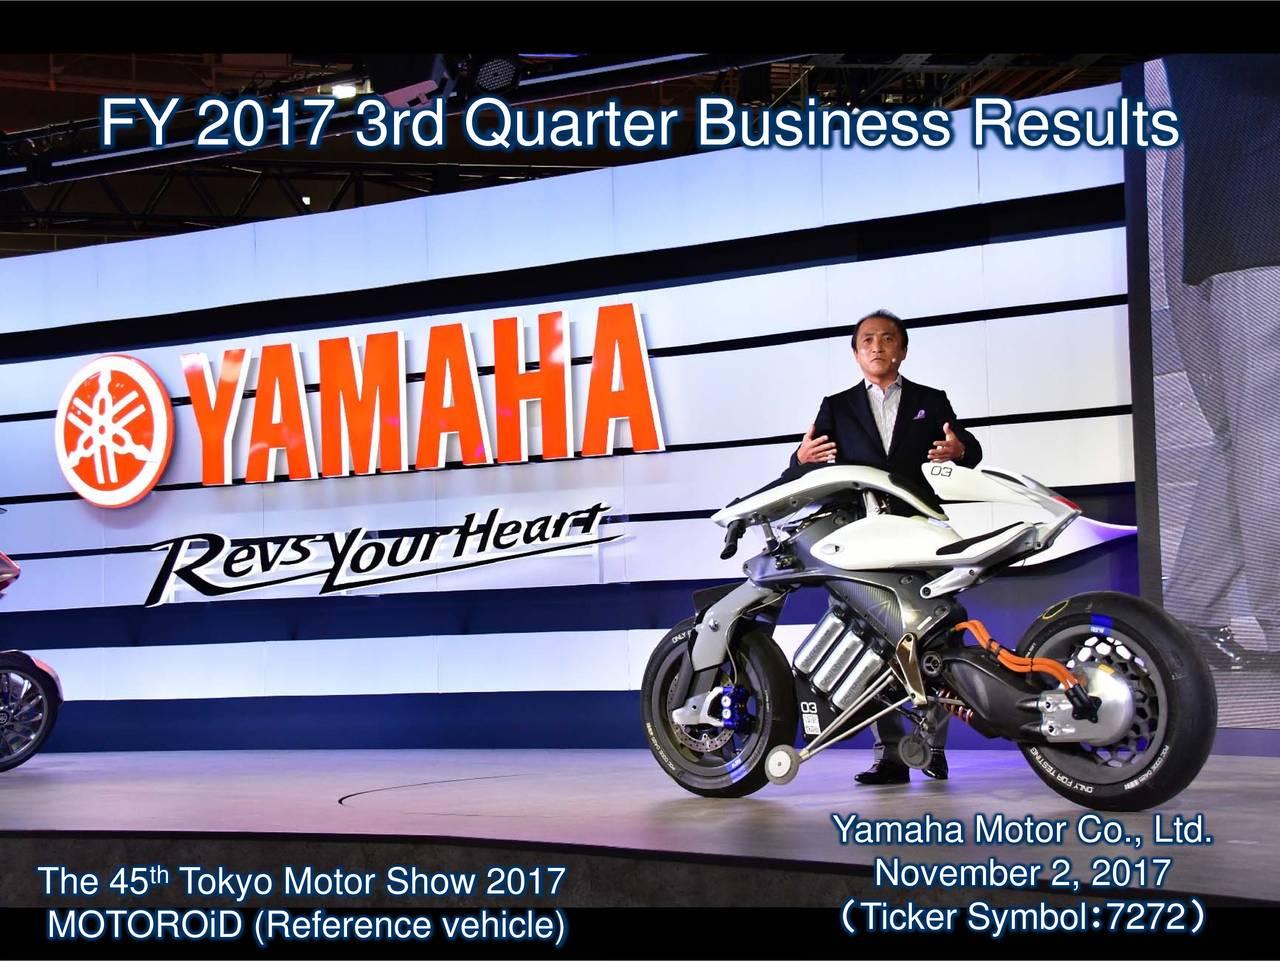 yamaha motor co ltd adr 2017 q3 results earnings call slides [ 1280 x 961 Pixel ]